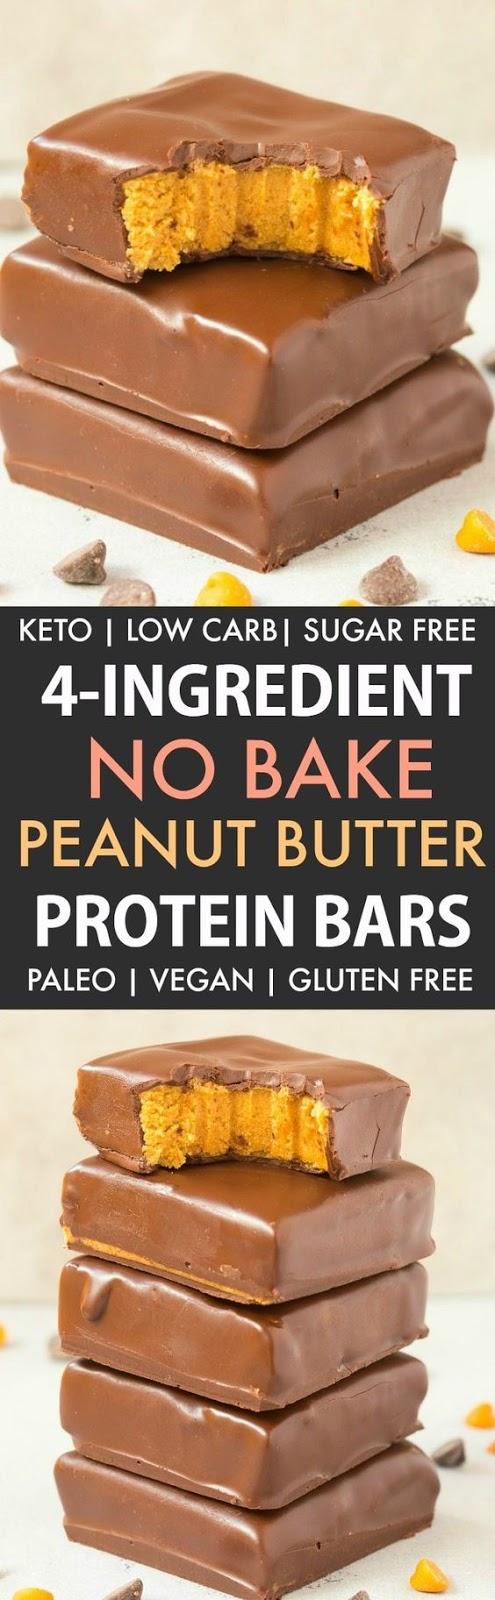 No Bake Peanut Butter Protein Bars (Keto, Vegan, Paleo)